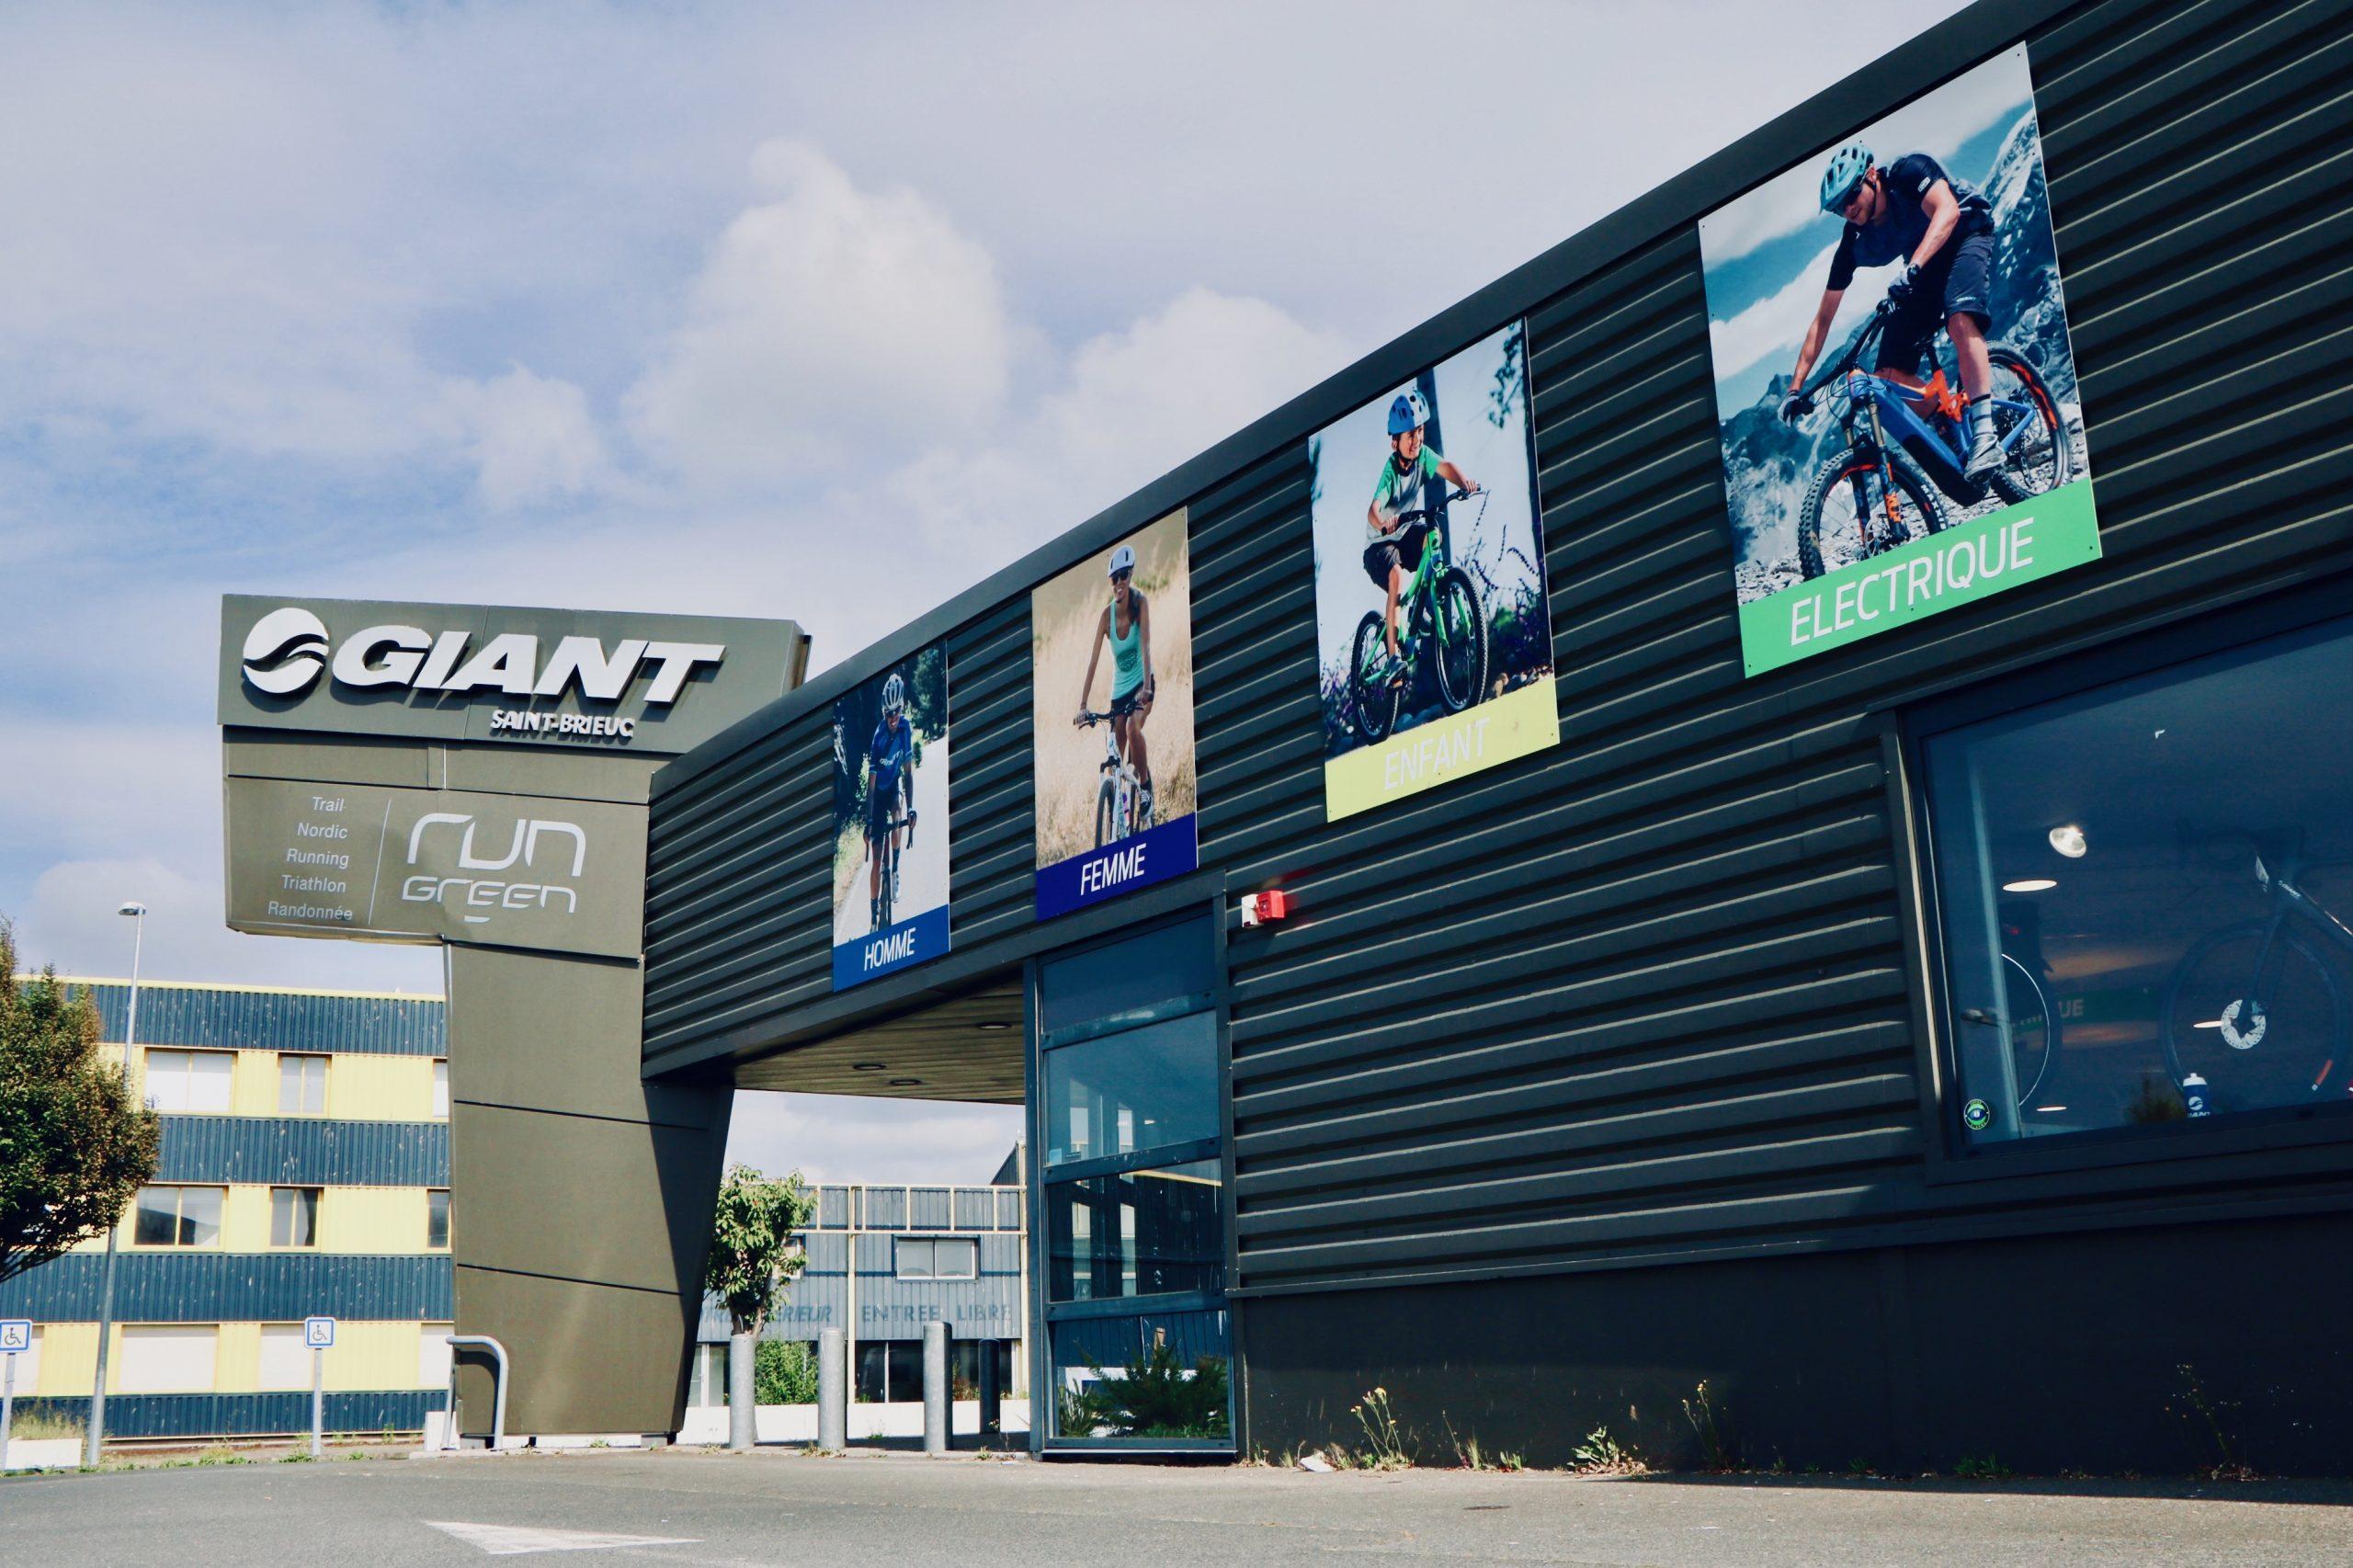 Giant & Run Green - Langueux (22)